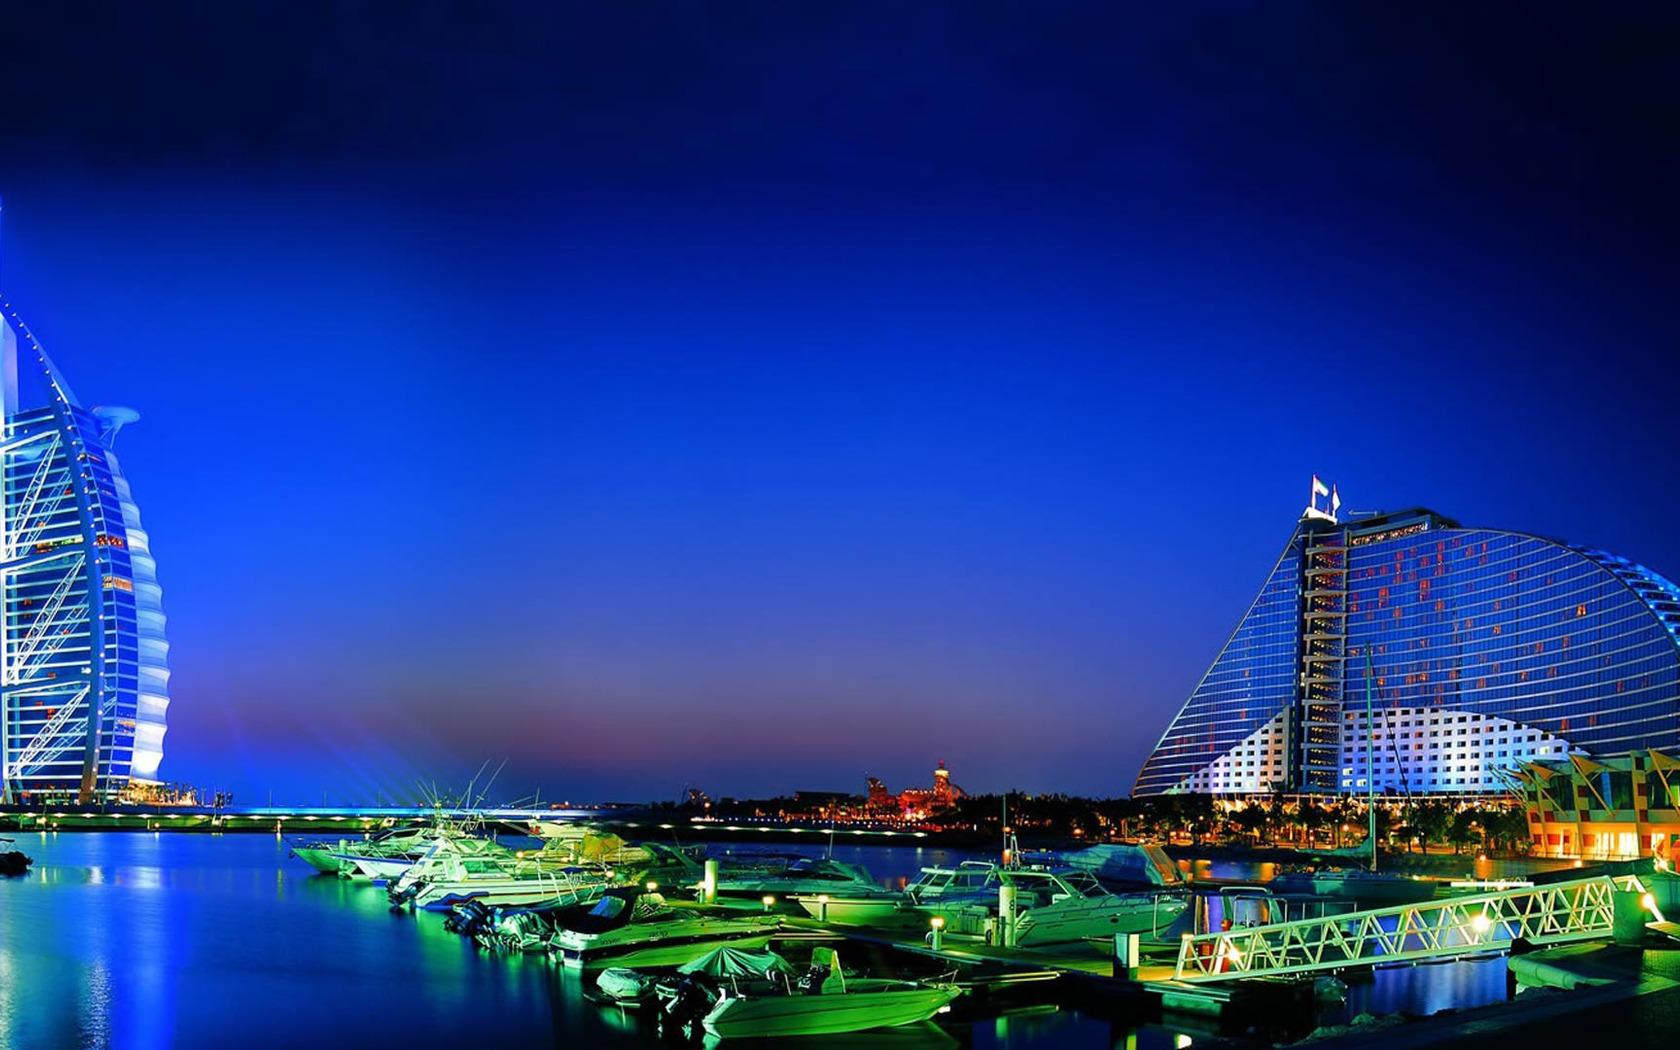 Dubai at night wallpaper 1347 1680x1050